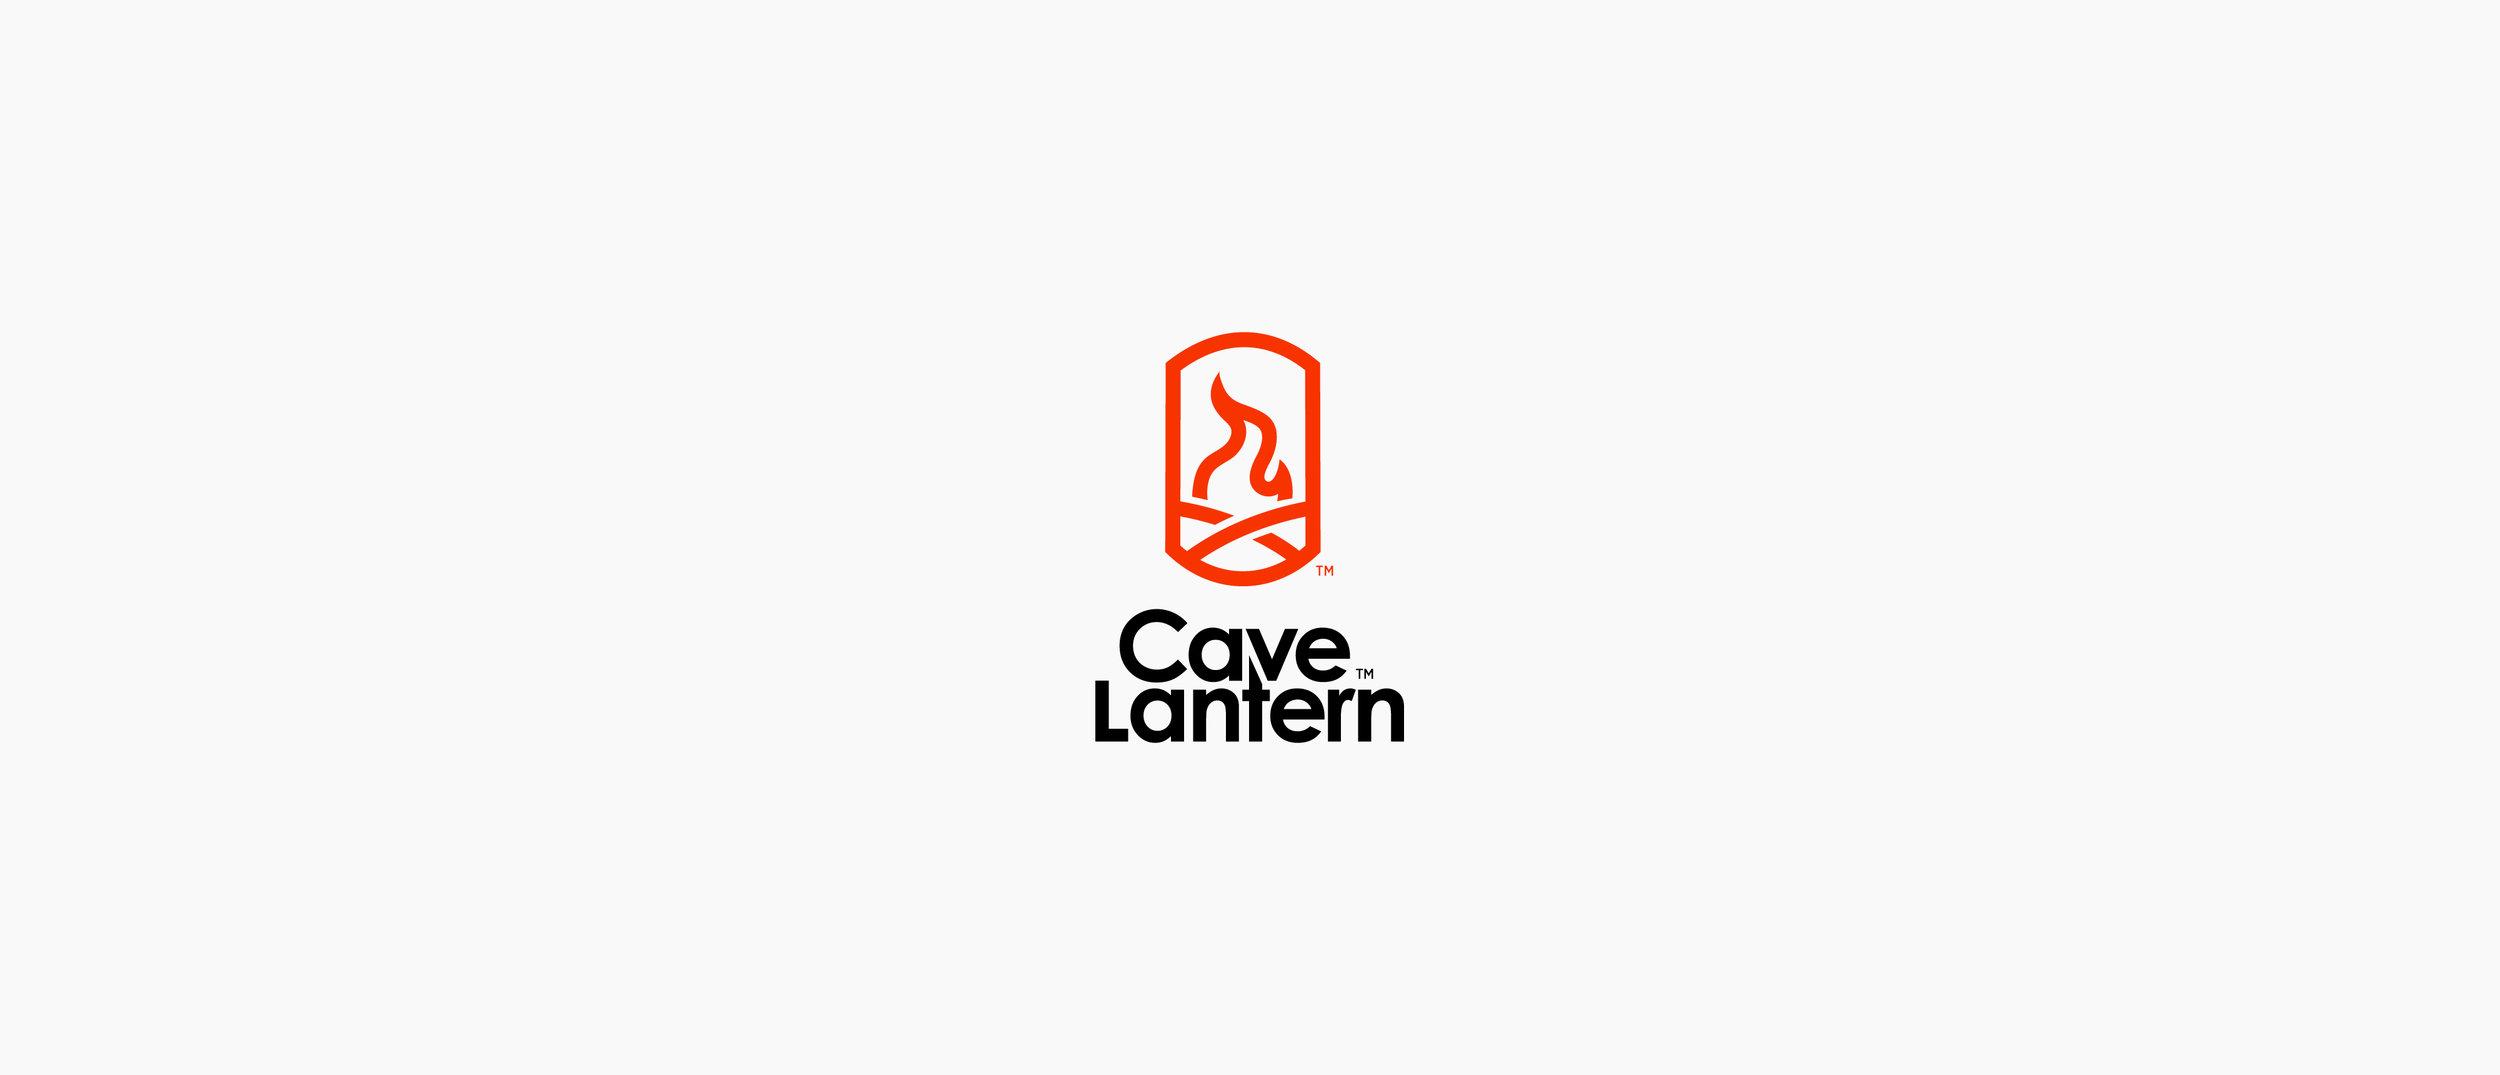 CaveLantern | Creative studio | 2016